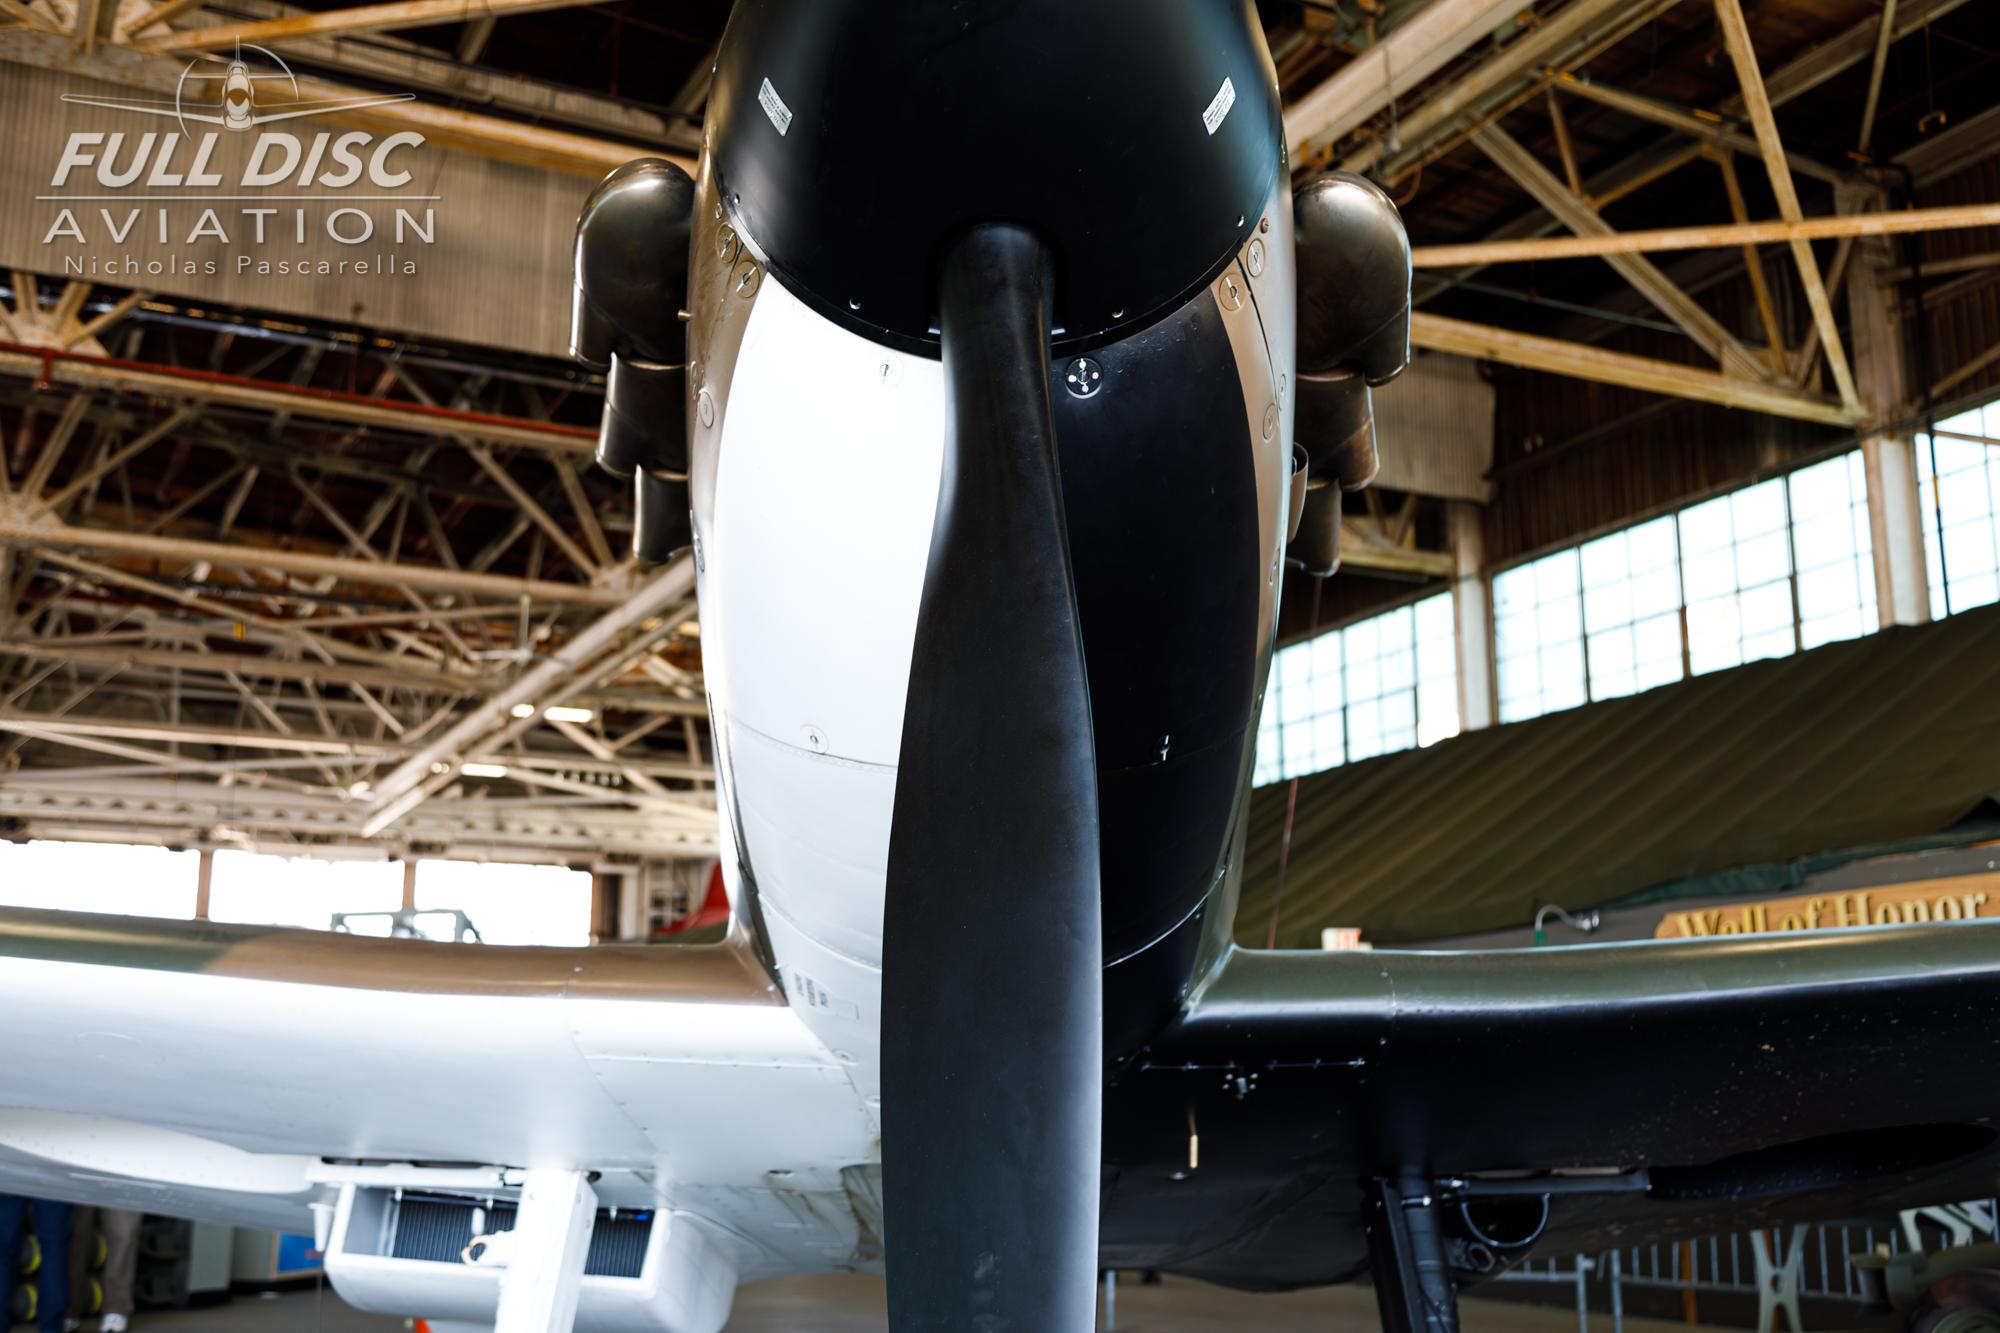 americanairpowermuseum_nicholaspascarella_nickpascarella_fulldiscaviation_legendsofairpower2019_aviation_warbird_mk1_spitfire_supermarine.jpg